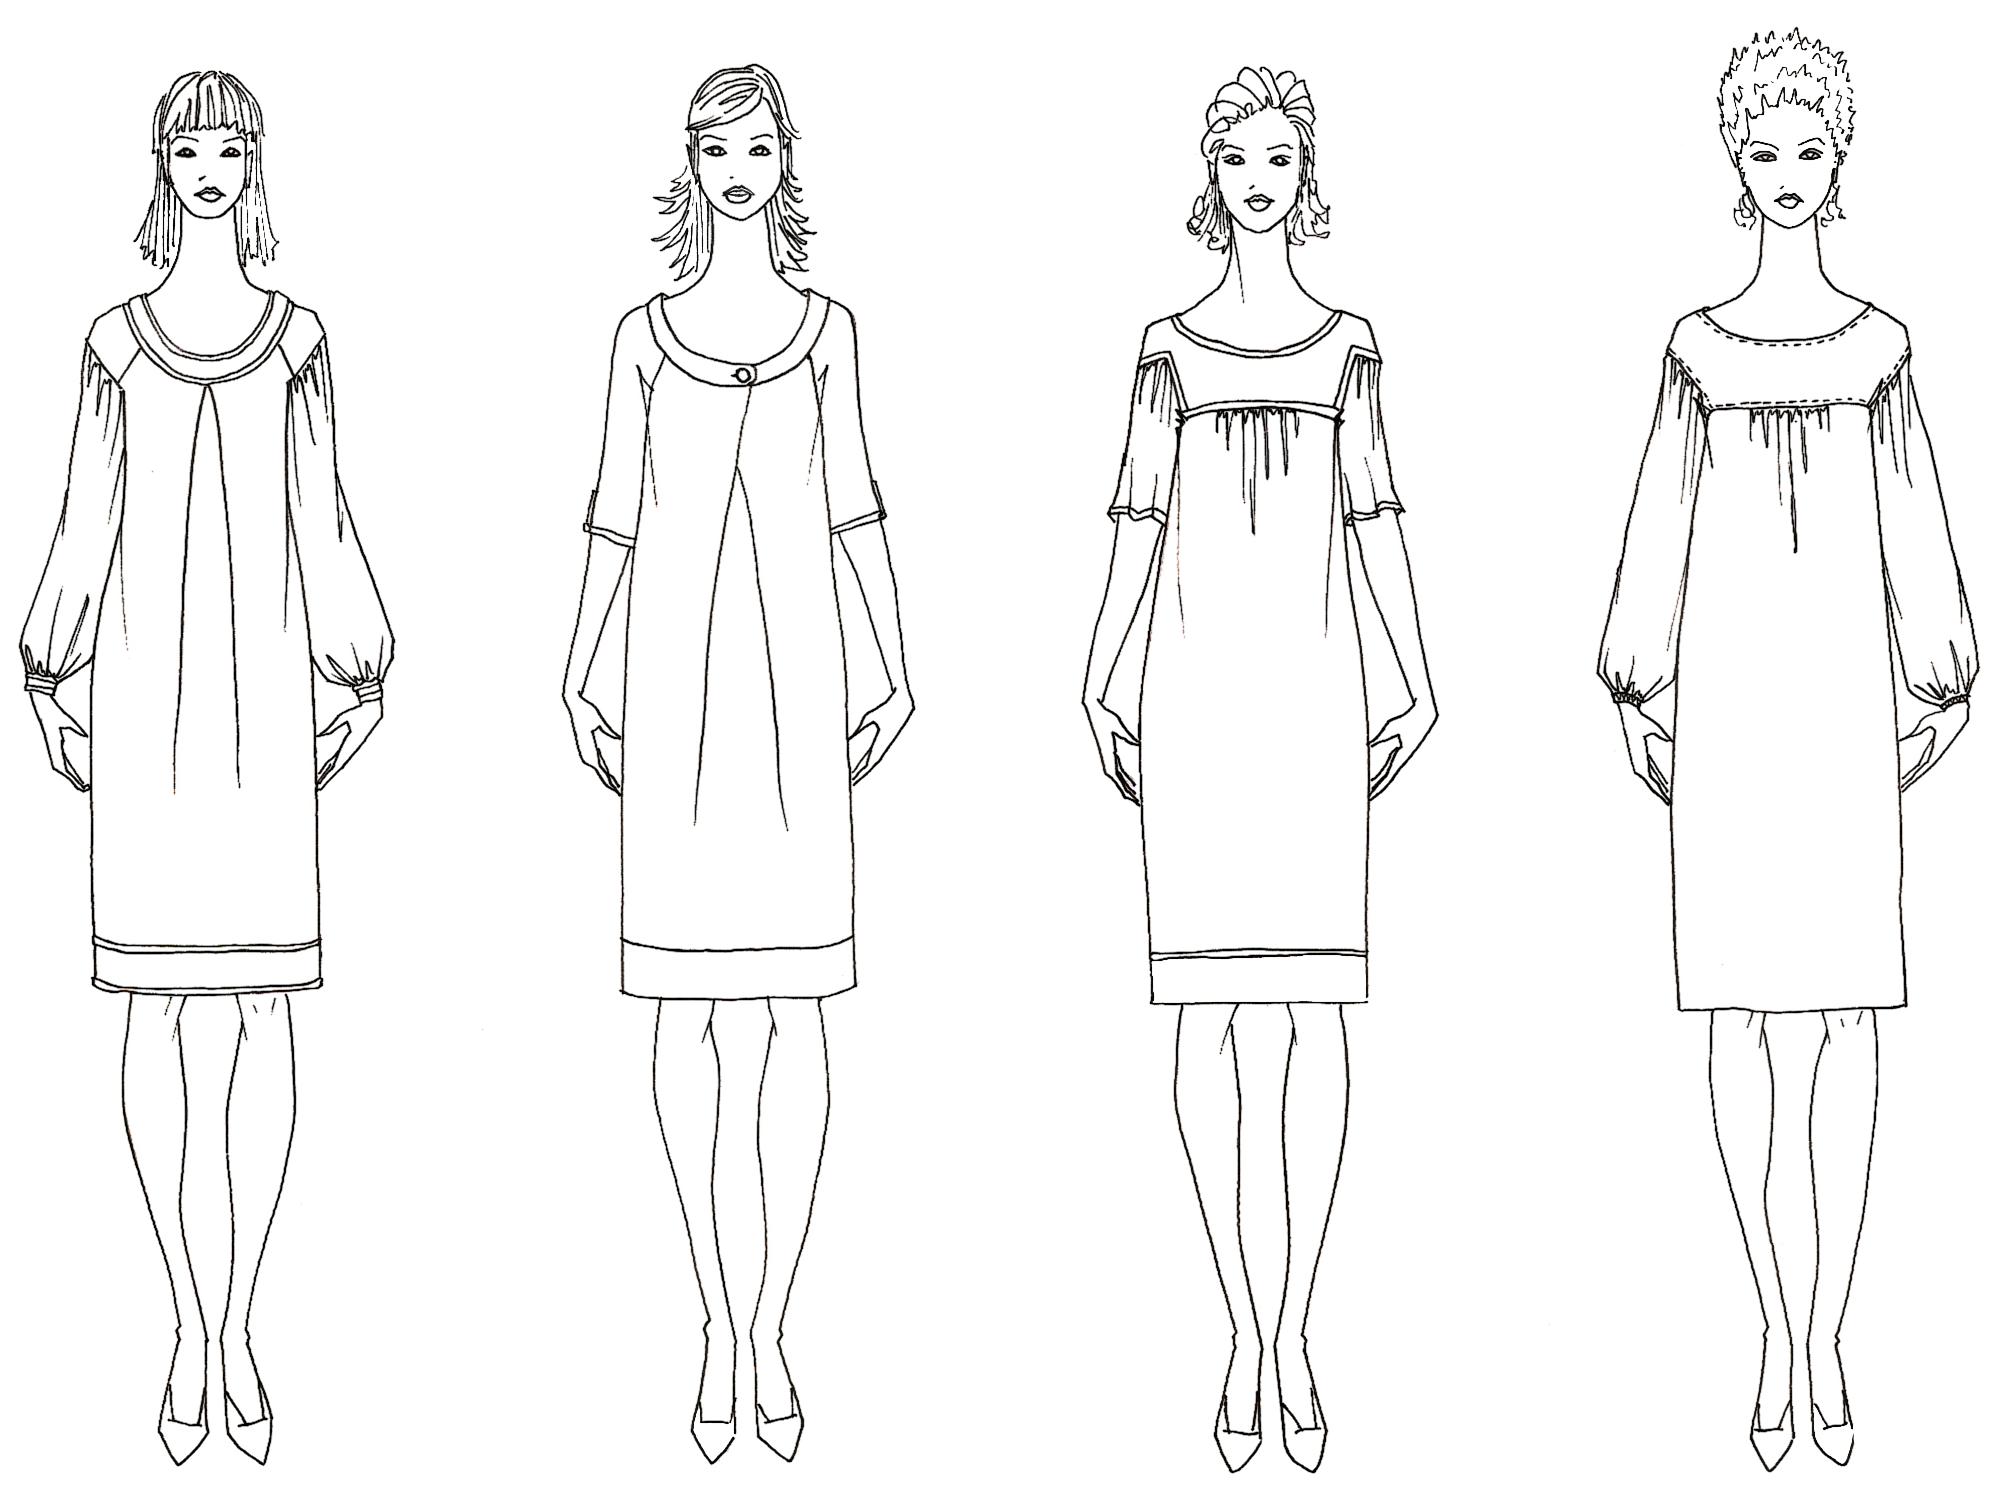 LineDrawings_Dress_03.png